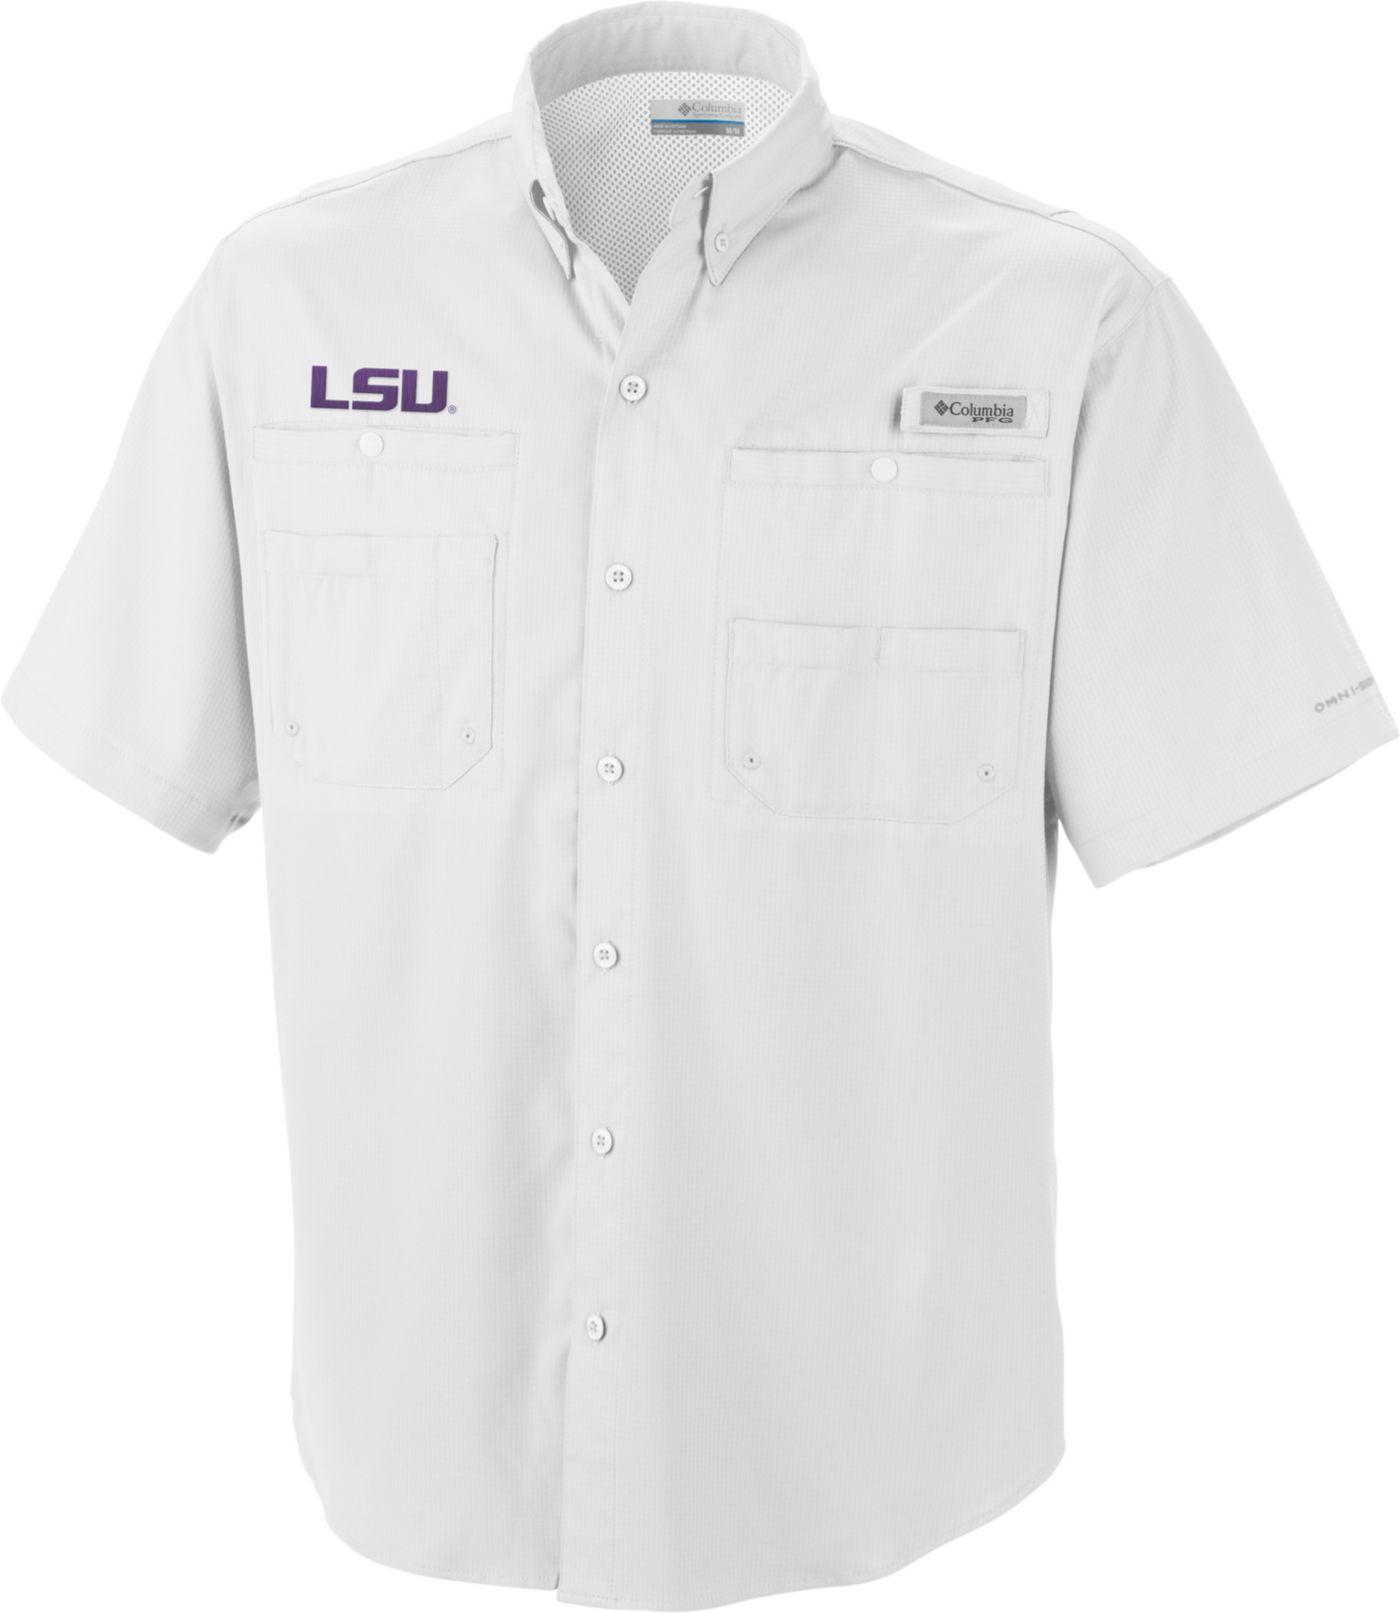 Columbia Men's LSU Tigers White Tamiami Performance Shirt